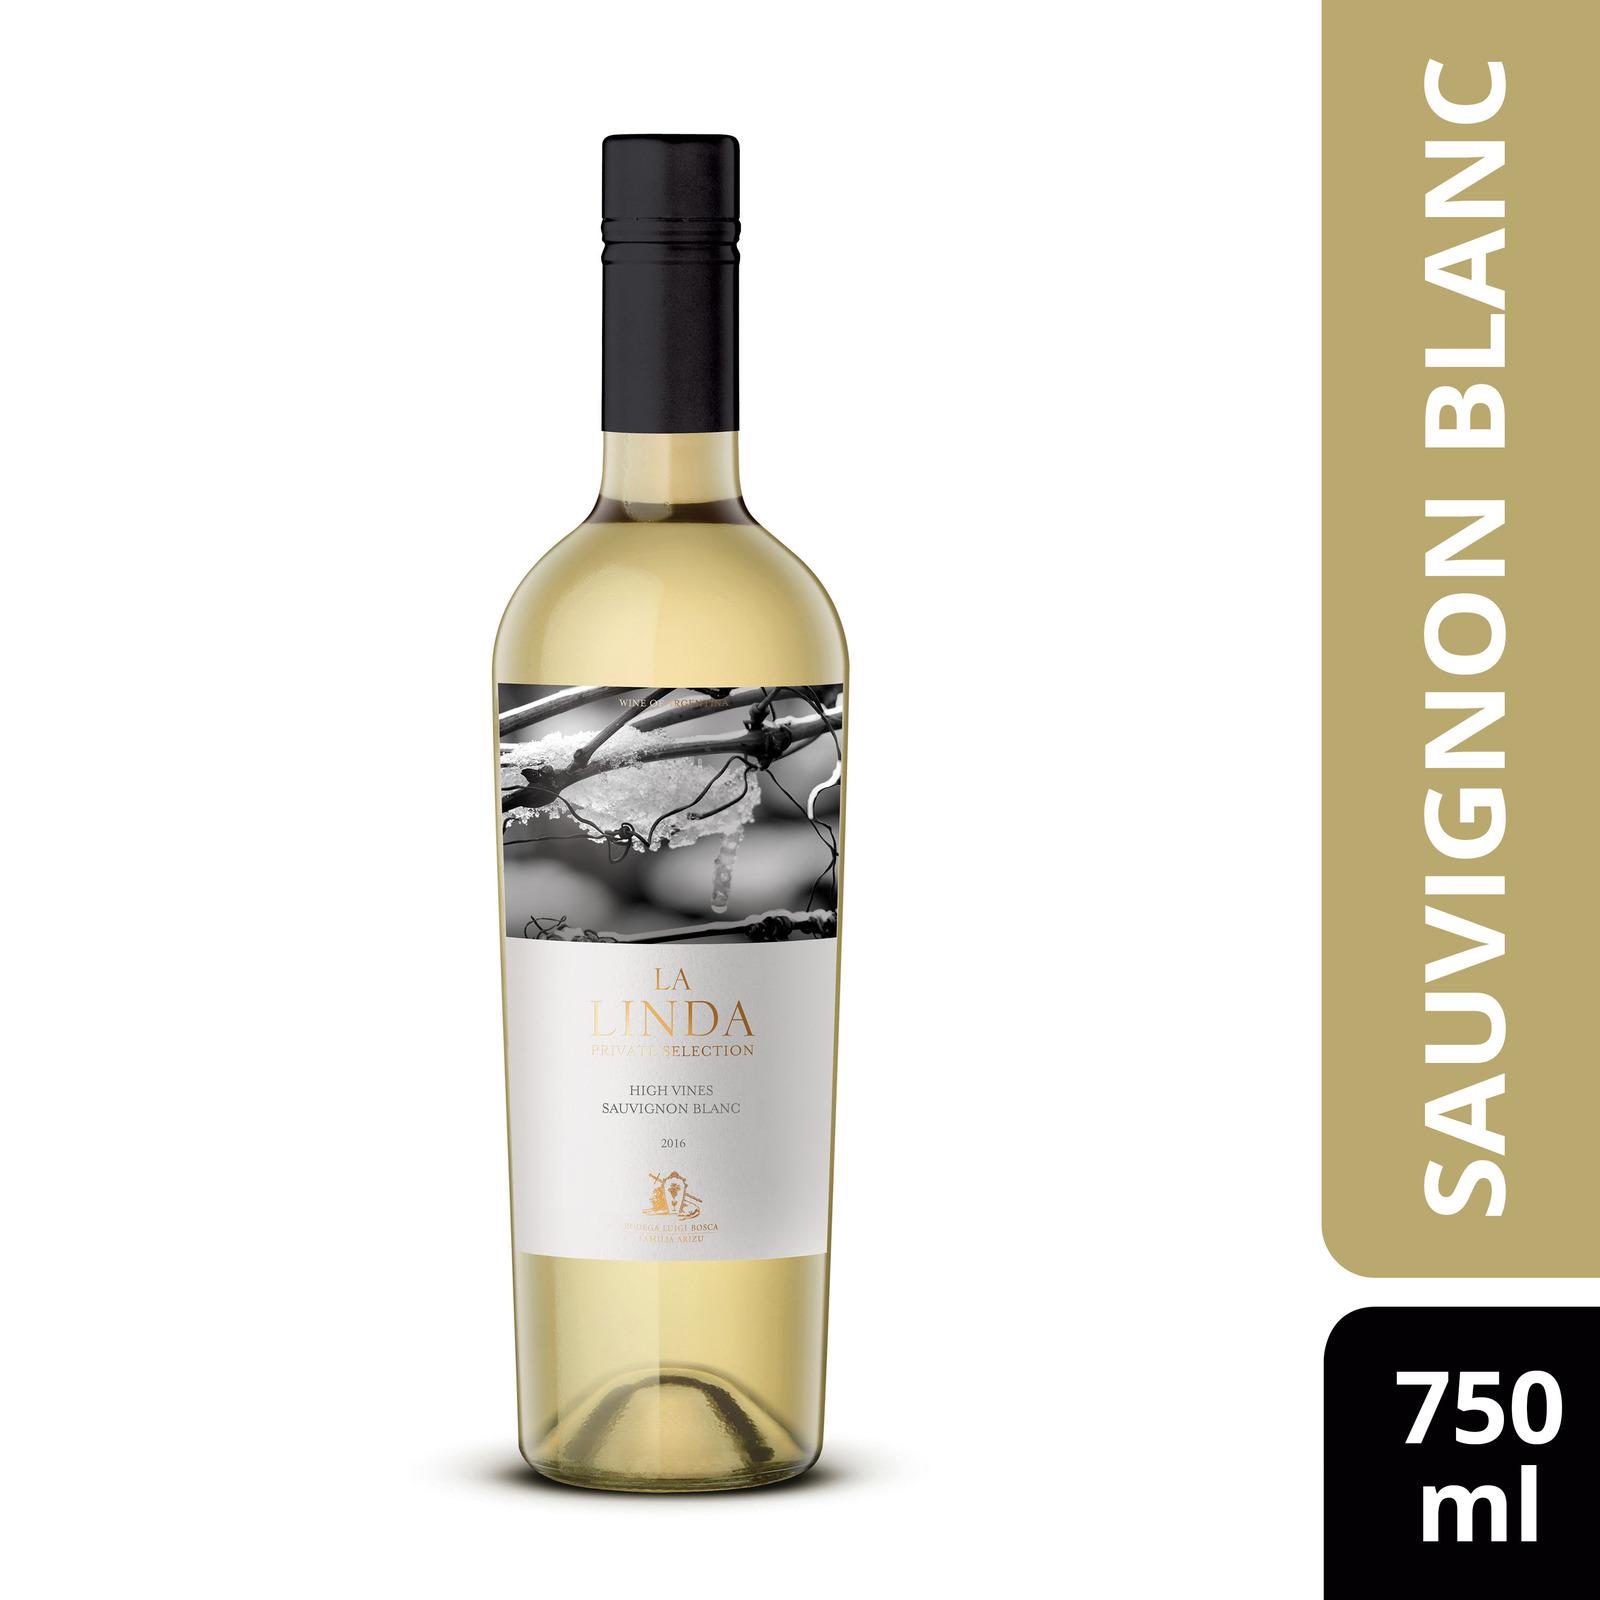 Luigi Bosca La Linda High Vines Sauvignon Blanc-By Culina